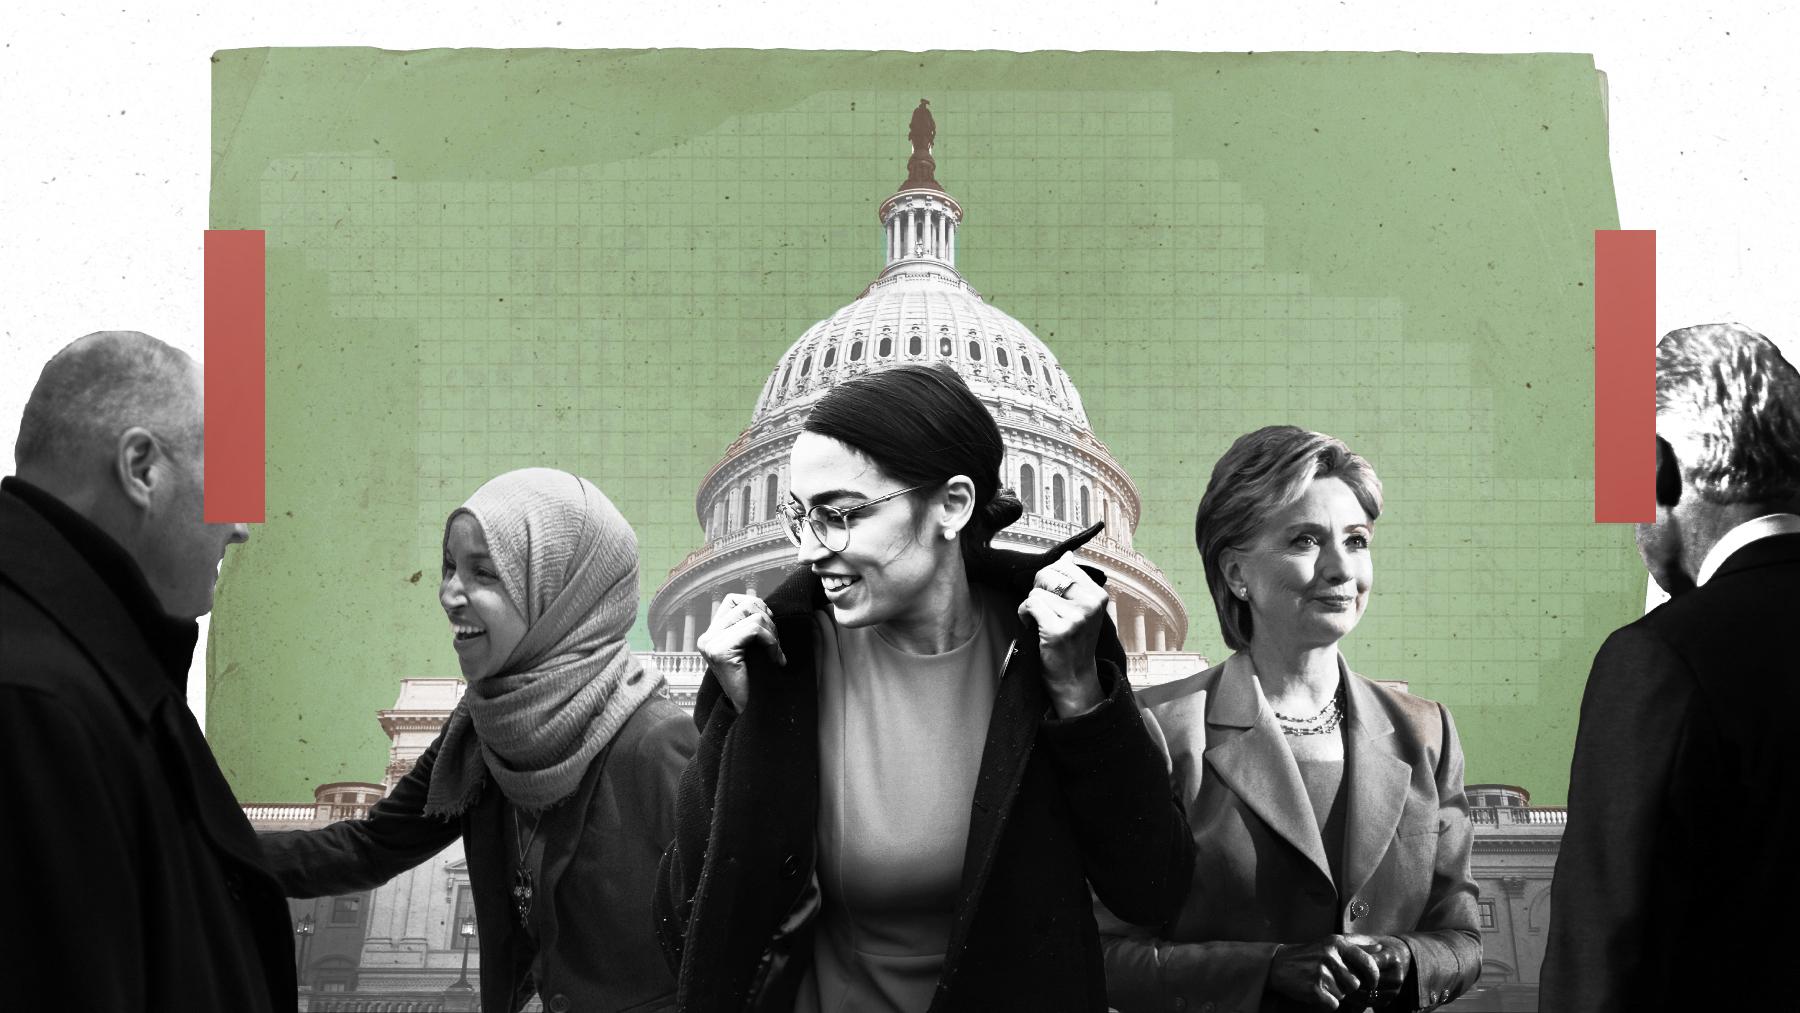 Not just Ocasio-Cortez: the fixation on women politicians' clothes - Vox